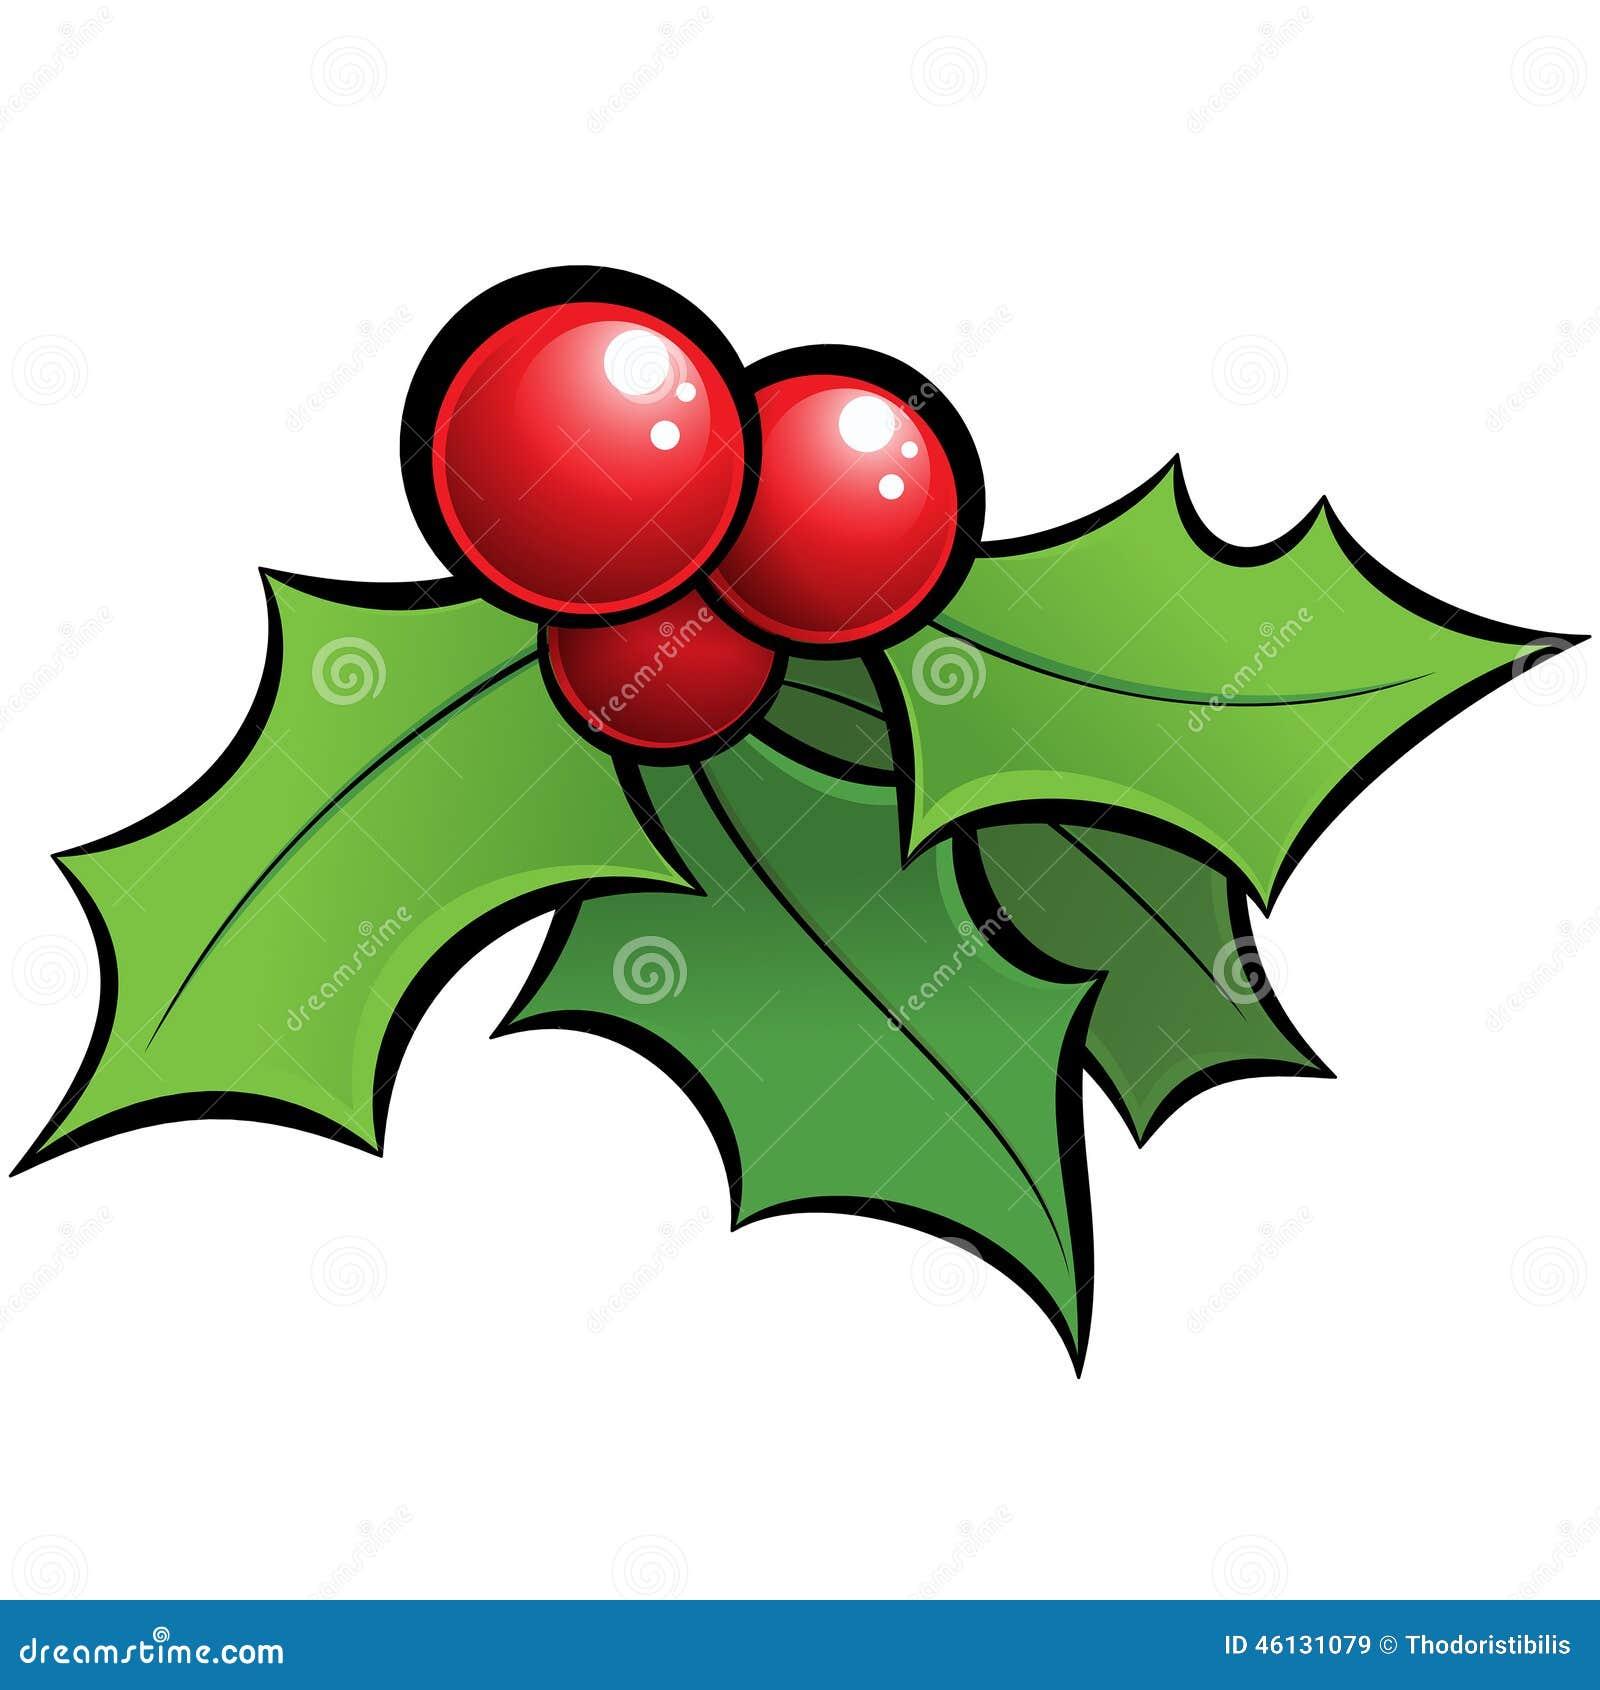 Cartoon Vector Shiny Holli Mistletoe Christmas Ornament